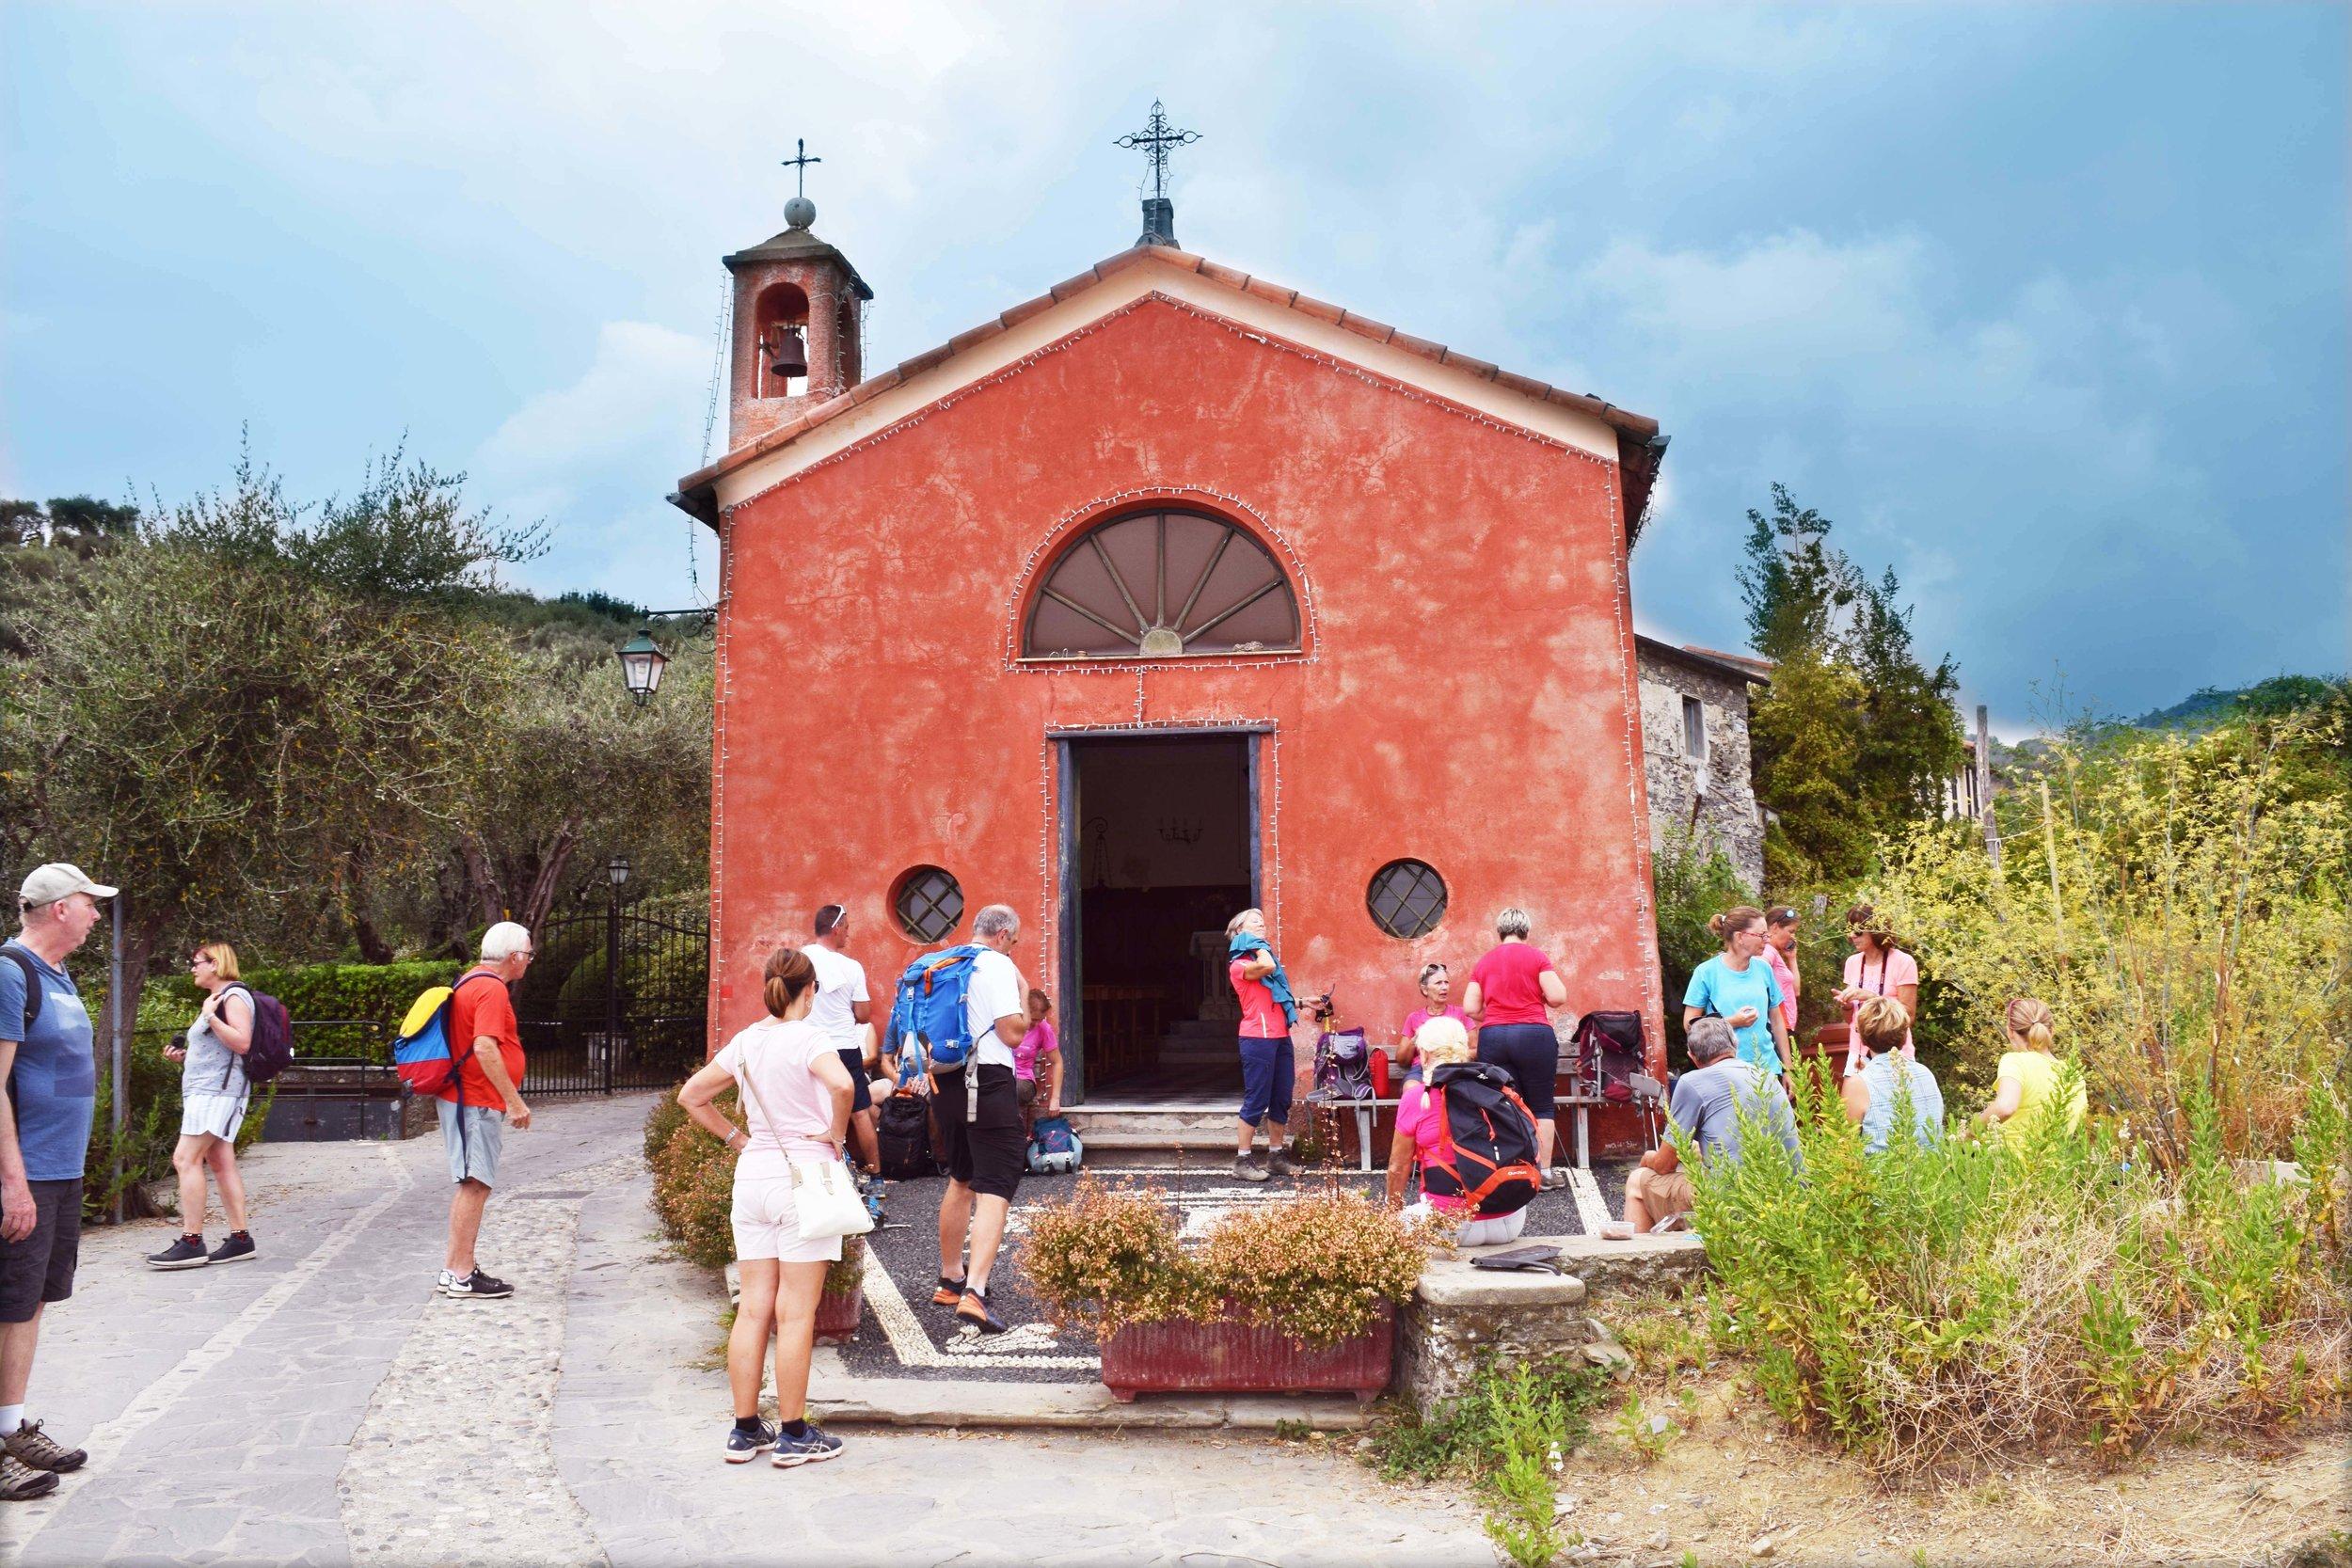 Hikers take a rest at the San Sebastiano Church.